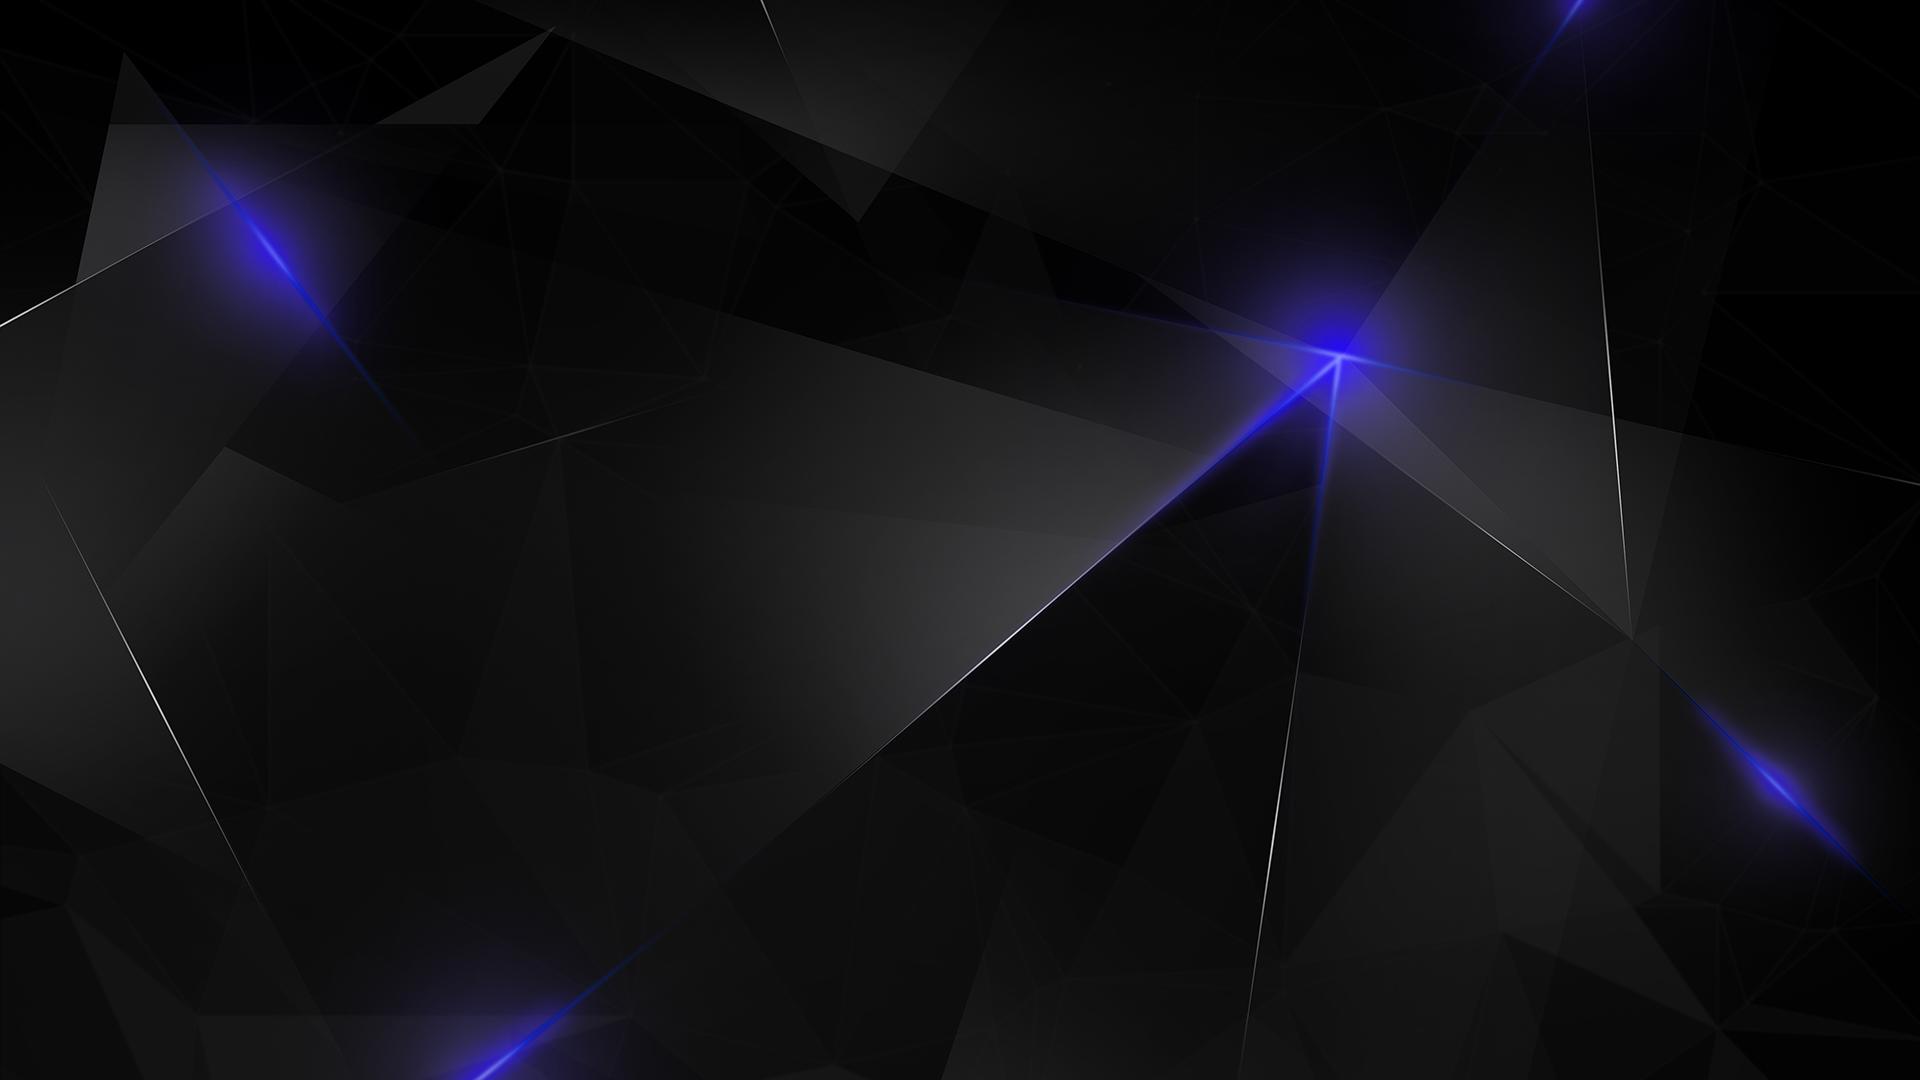 4k Dark Blue Polygon Wallpaper Hd